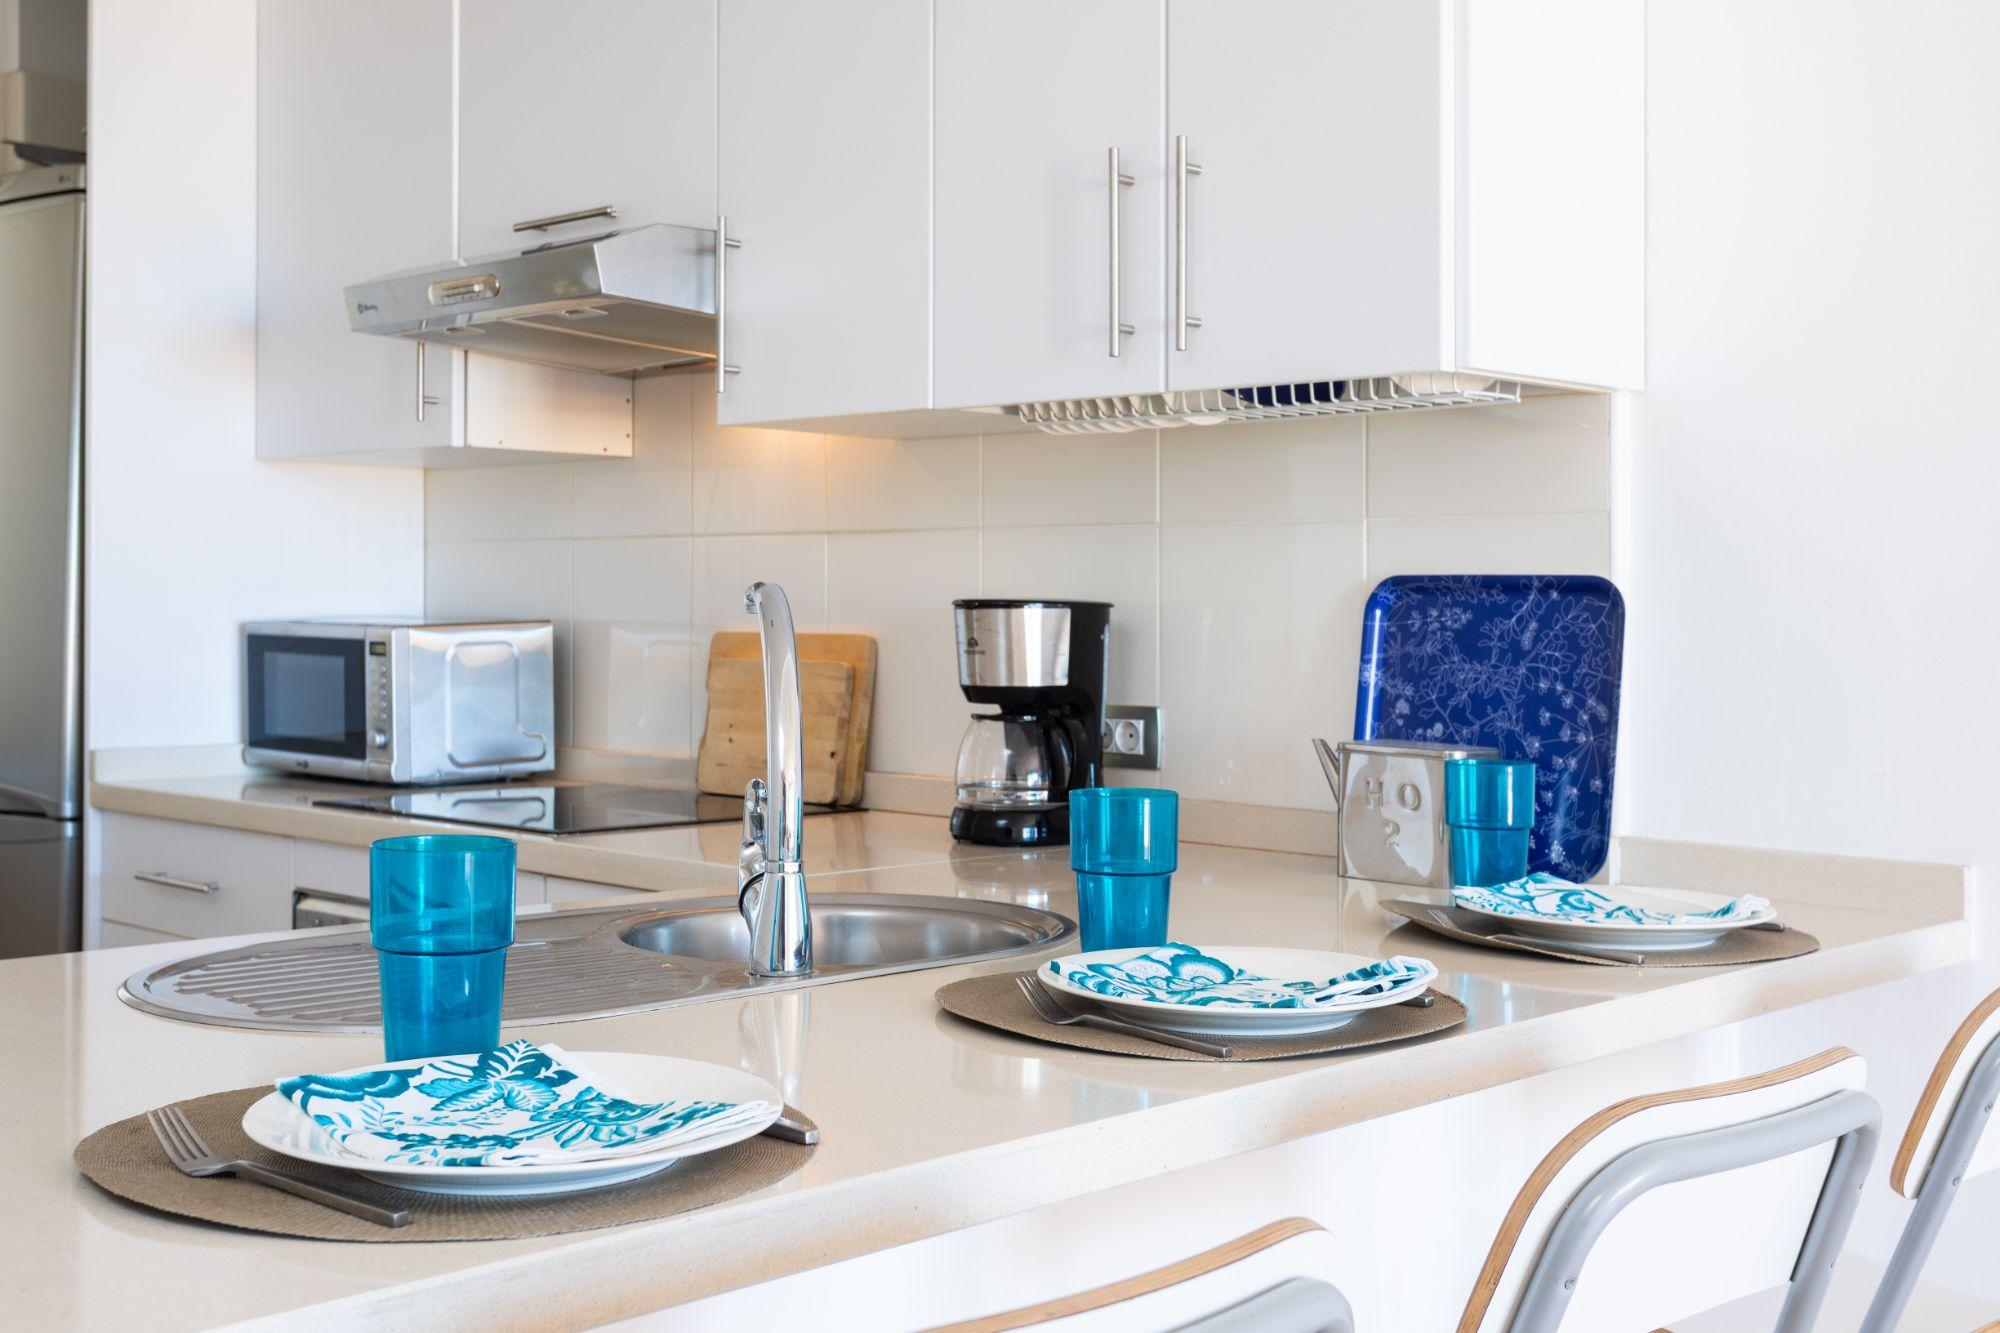 Residencial Cary, El Porís - Cocina con barra americana